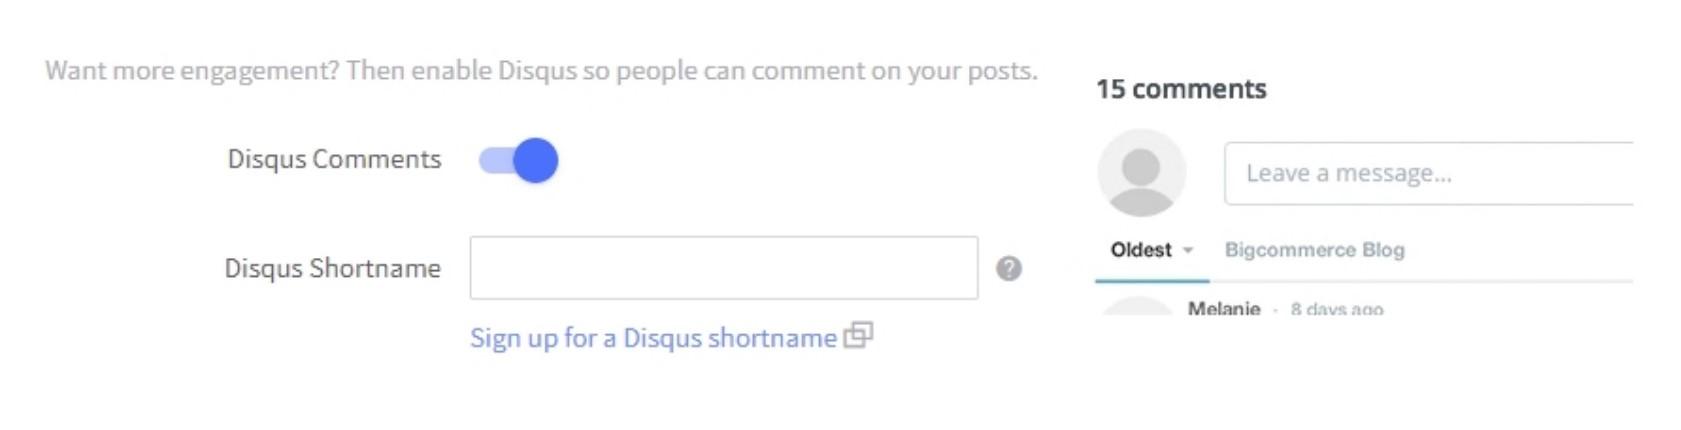 Enter Disqus Shortname